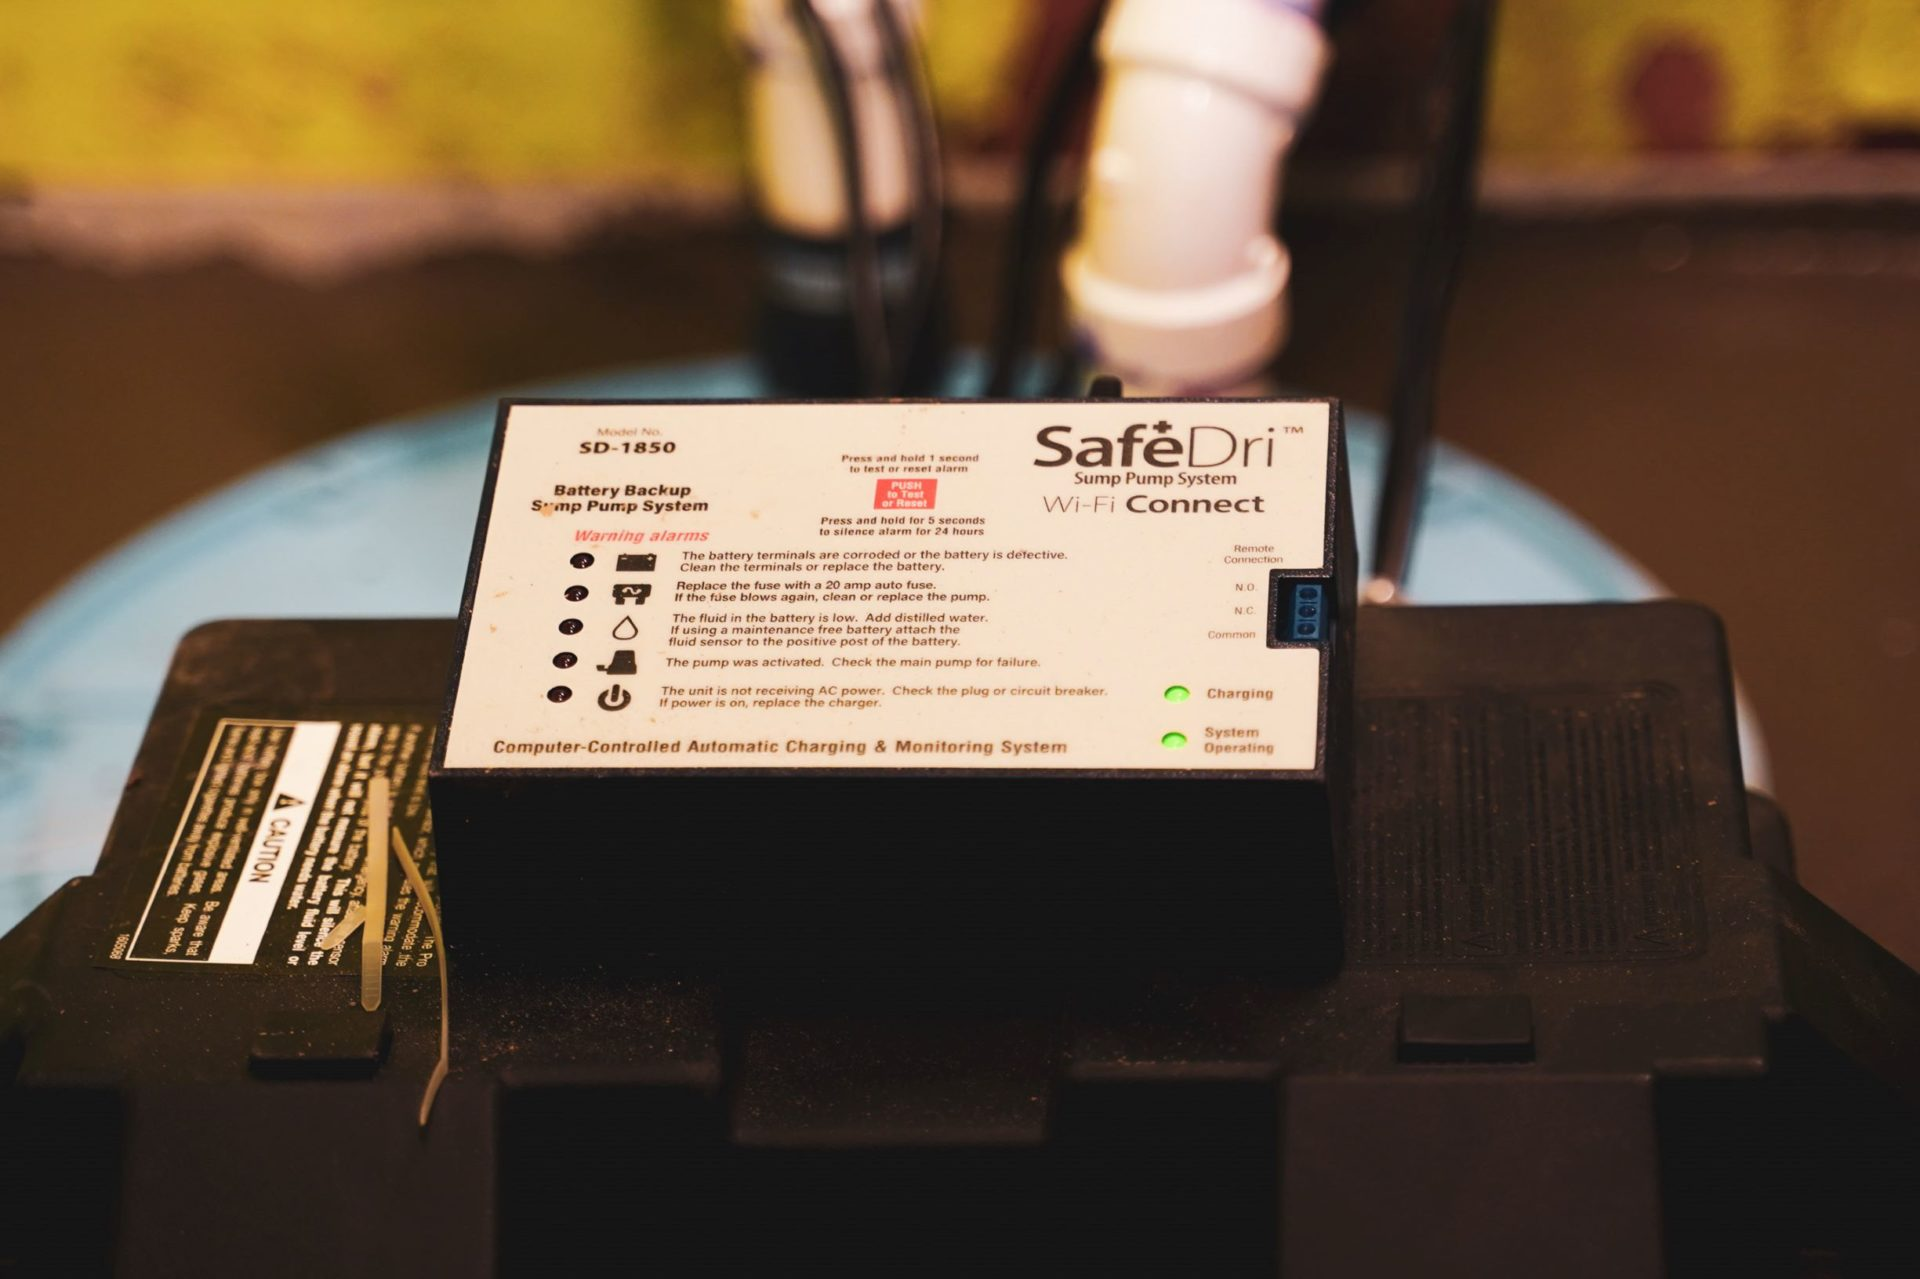 SafeDri Sump Pump Battery Backup